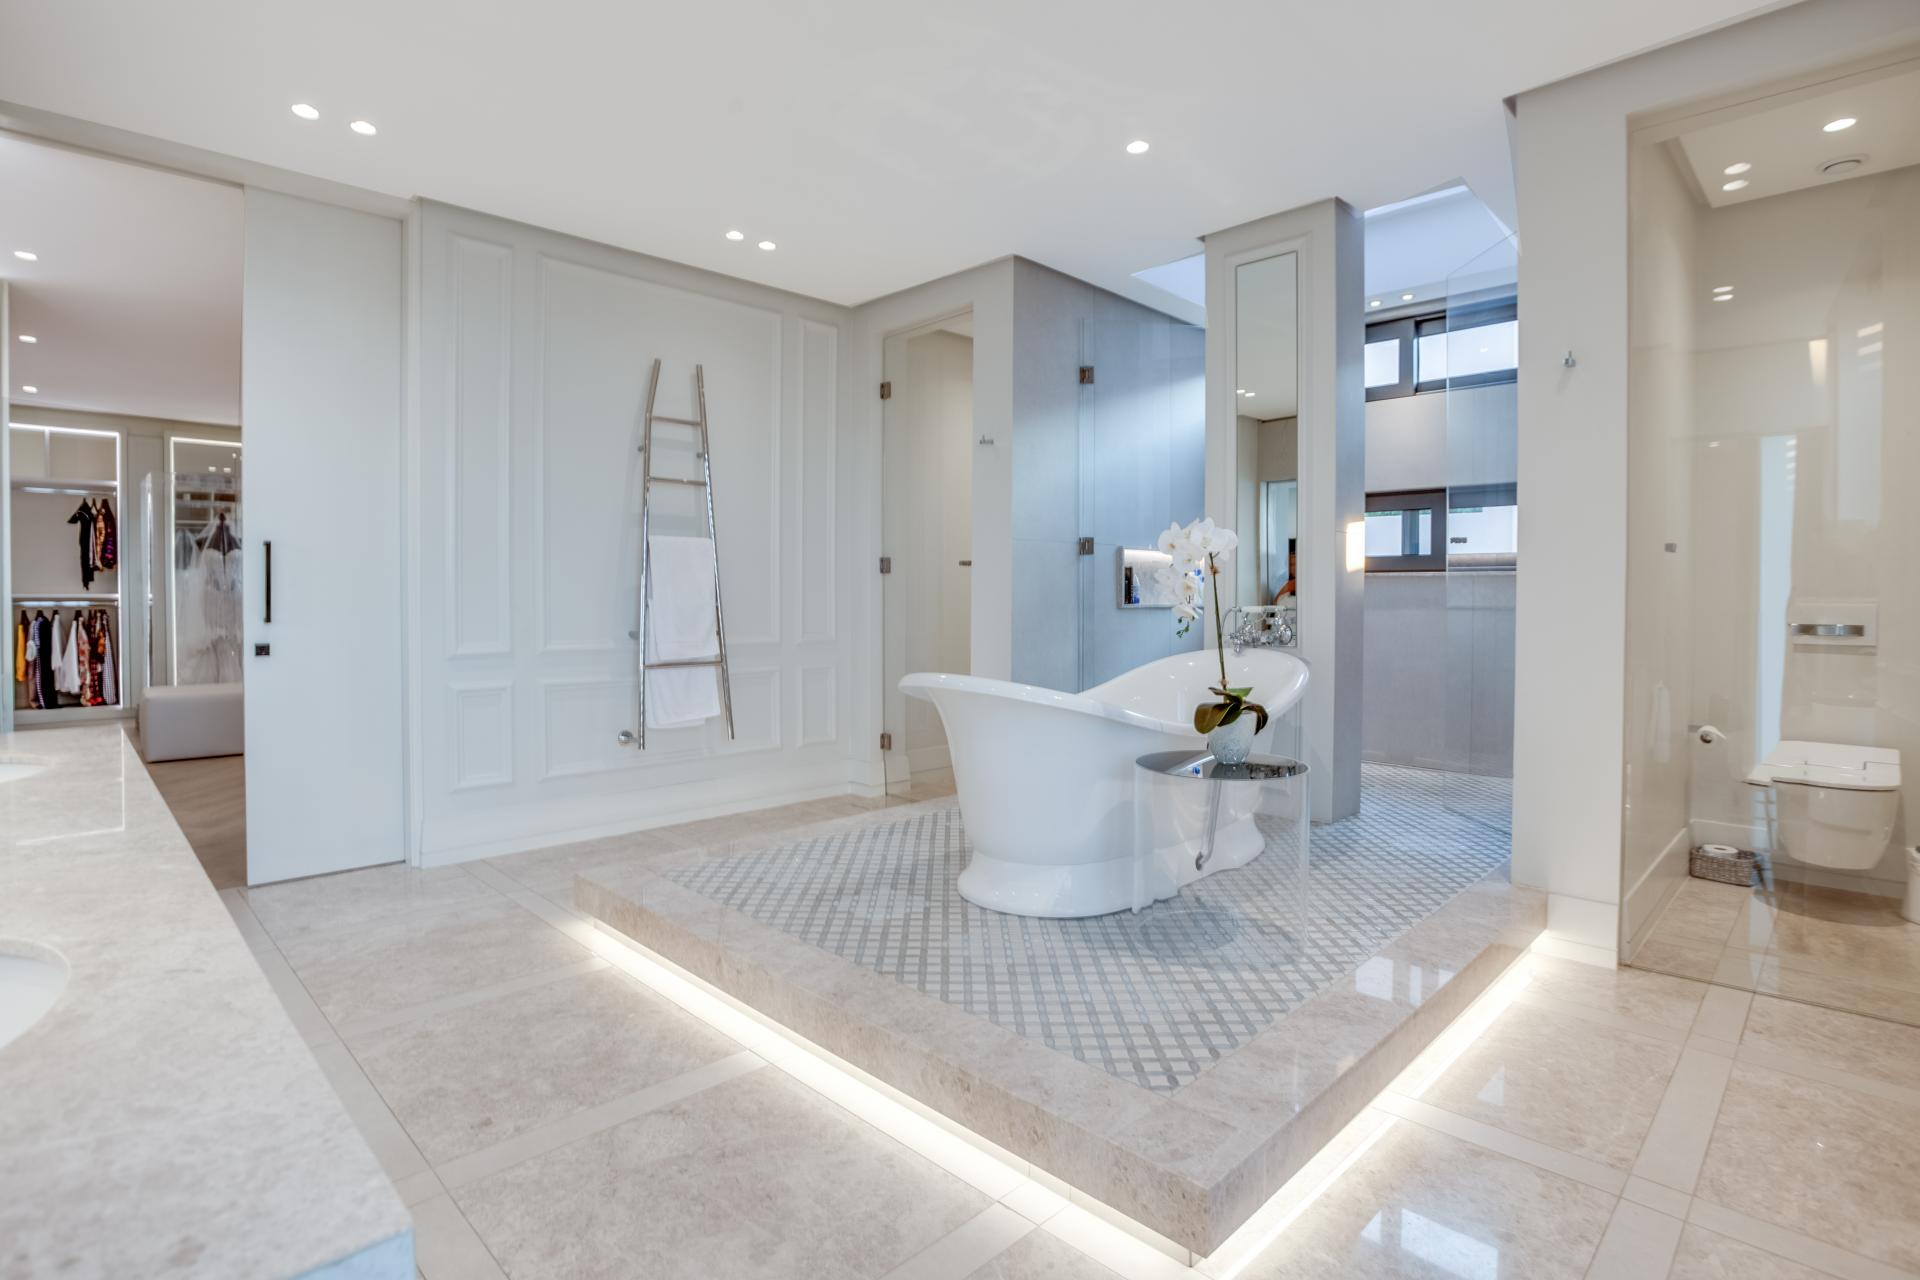 contemporary bright luxury bathroom with freestanding slip bathtub